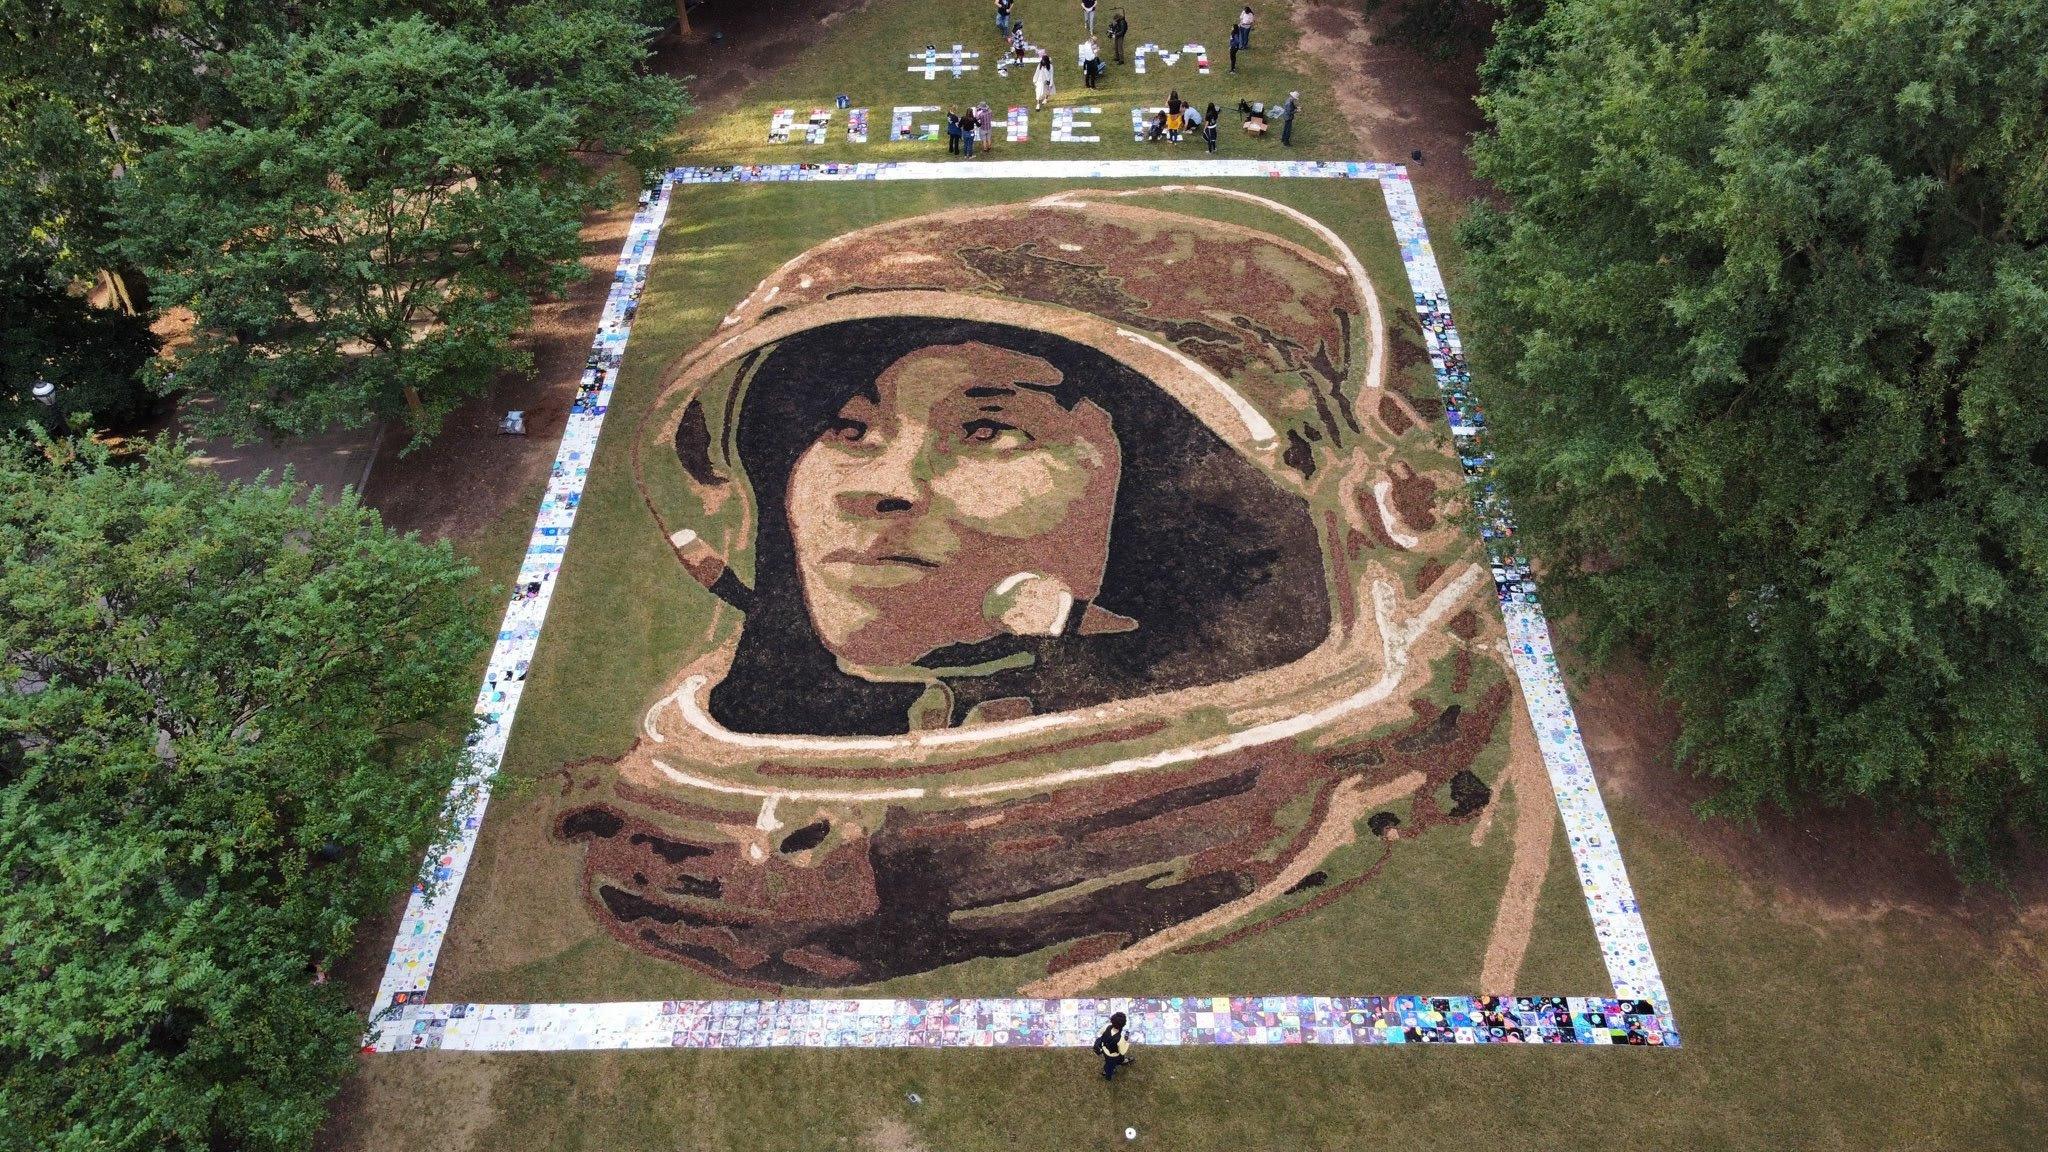 Landscape artist unveils a giant portrait of NASA pioneer Stephanie Wilson